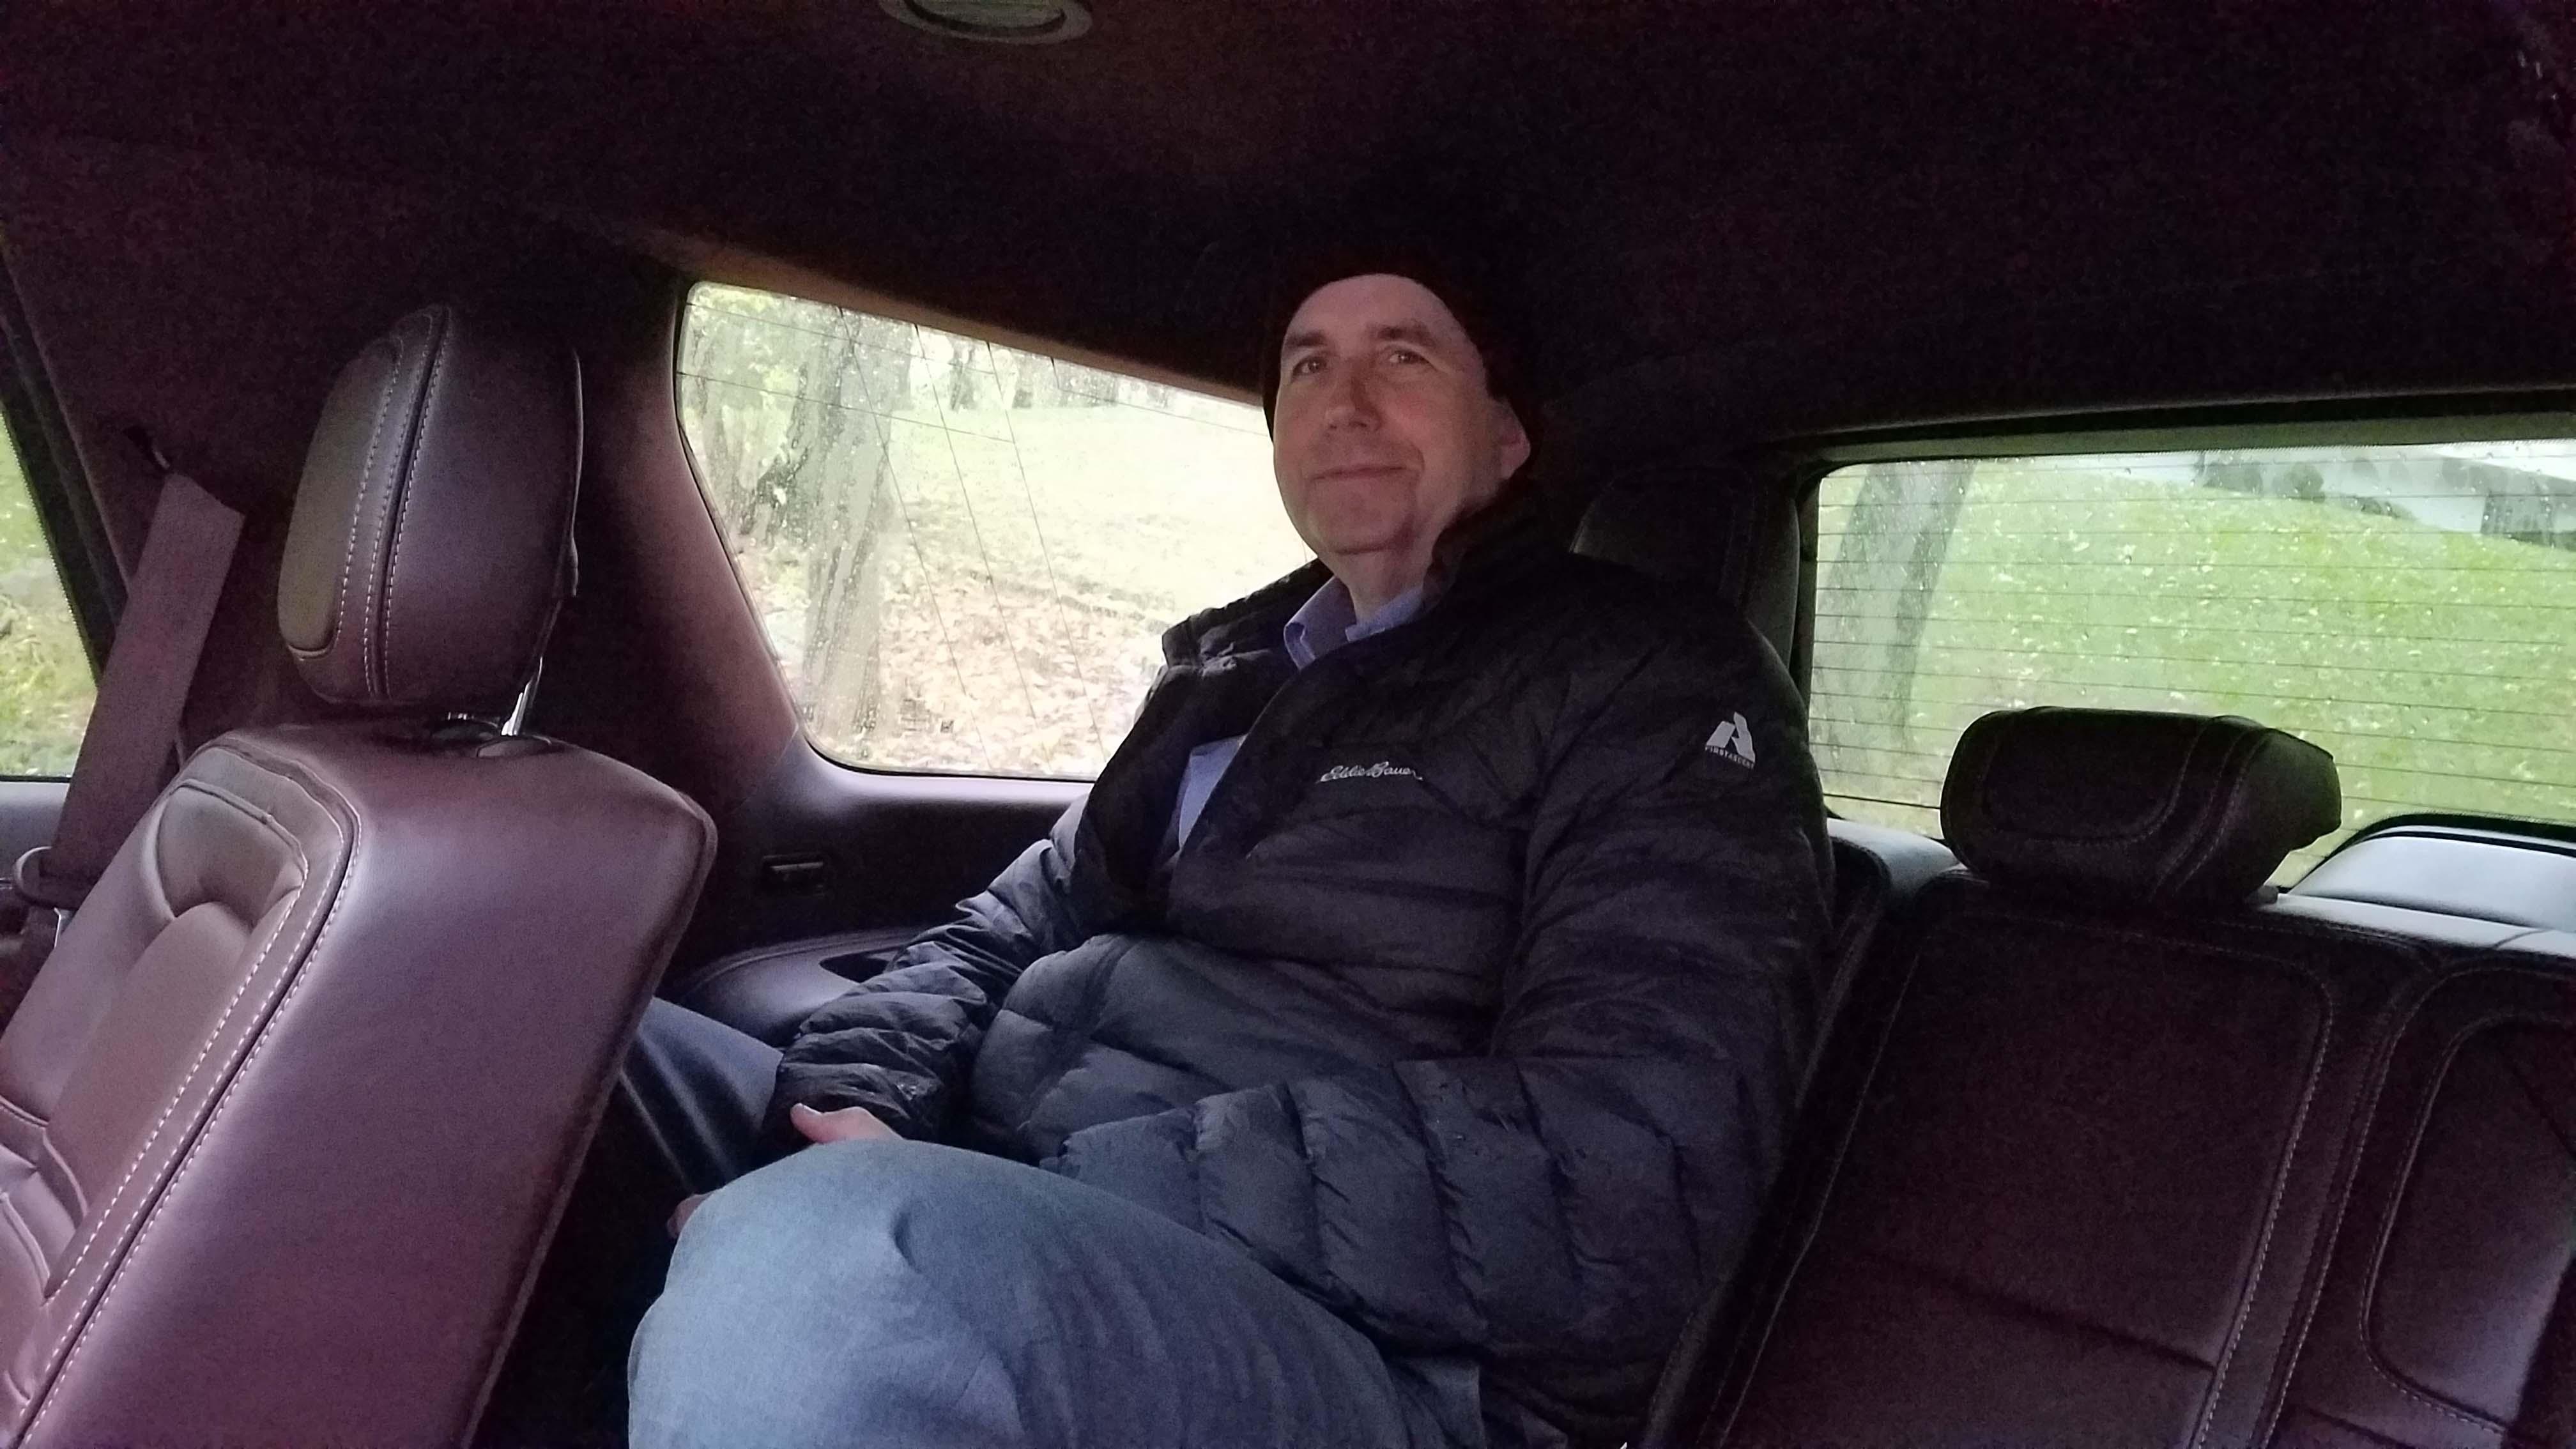 Detroit News auto critic Henry Payne — all 6'5